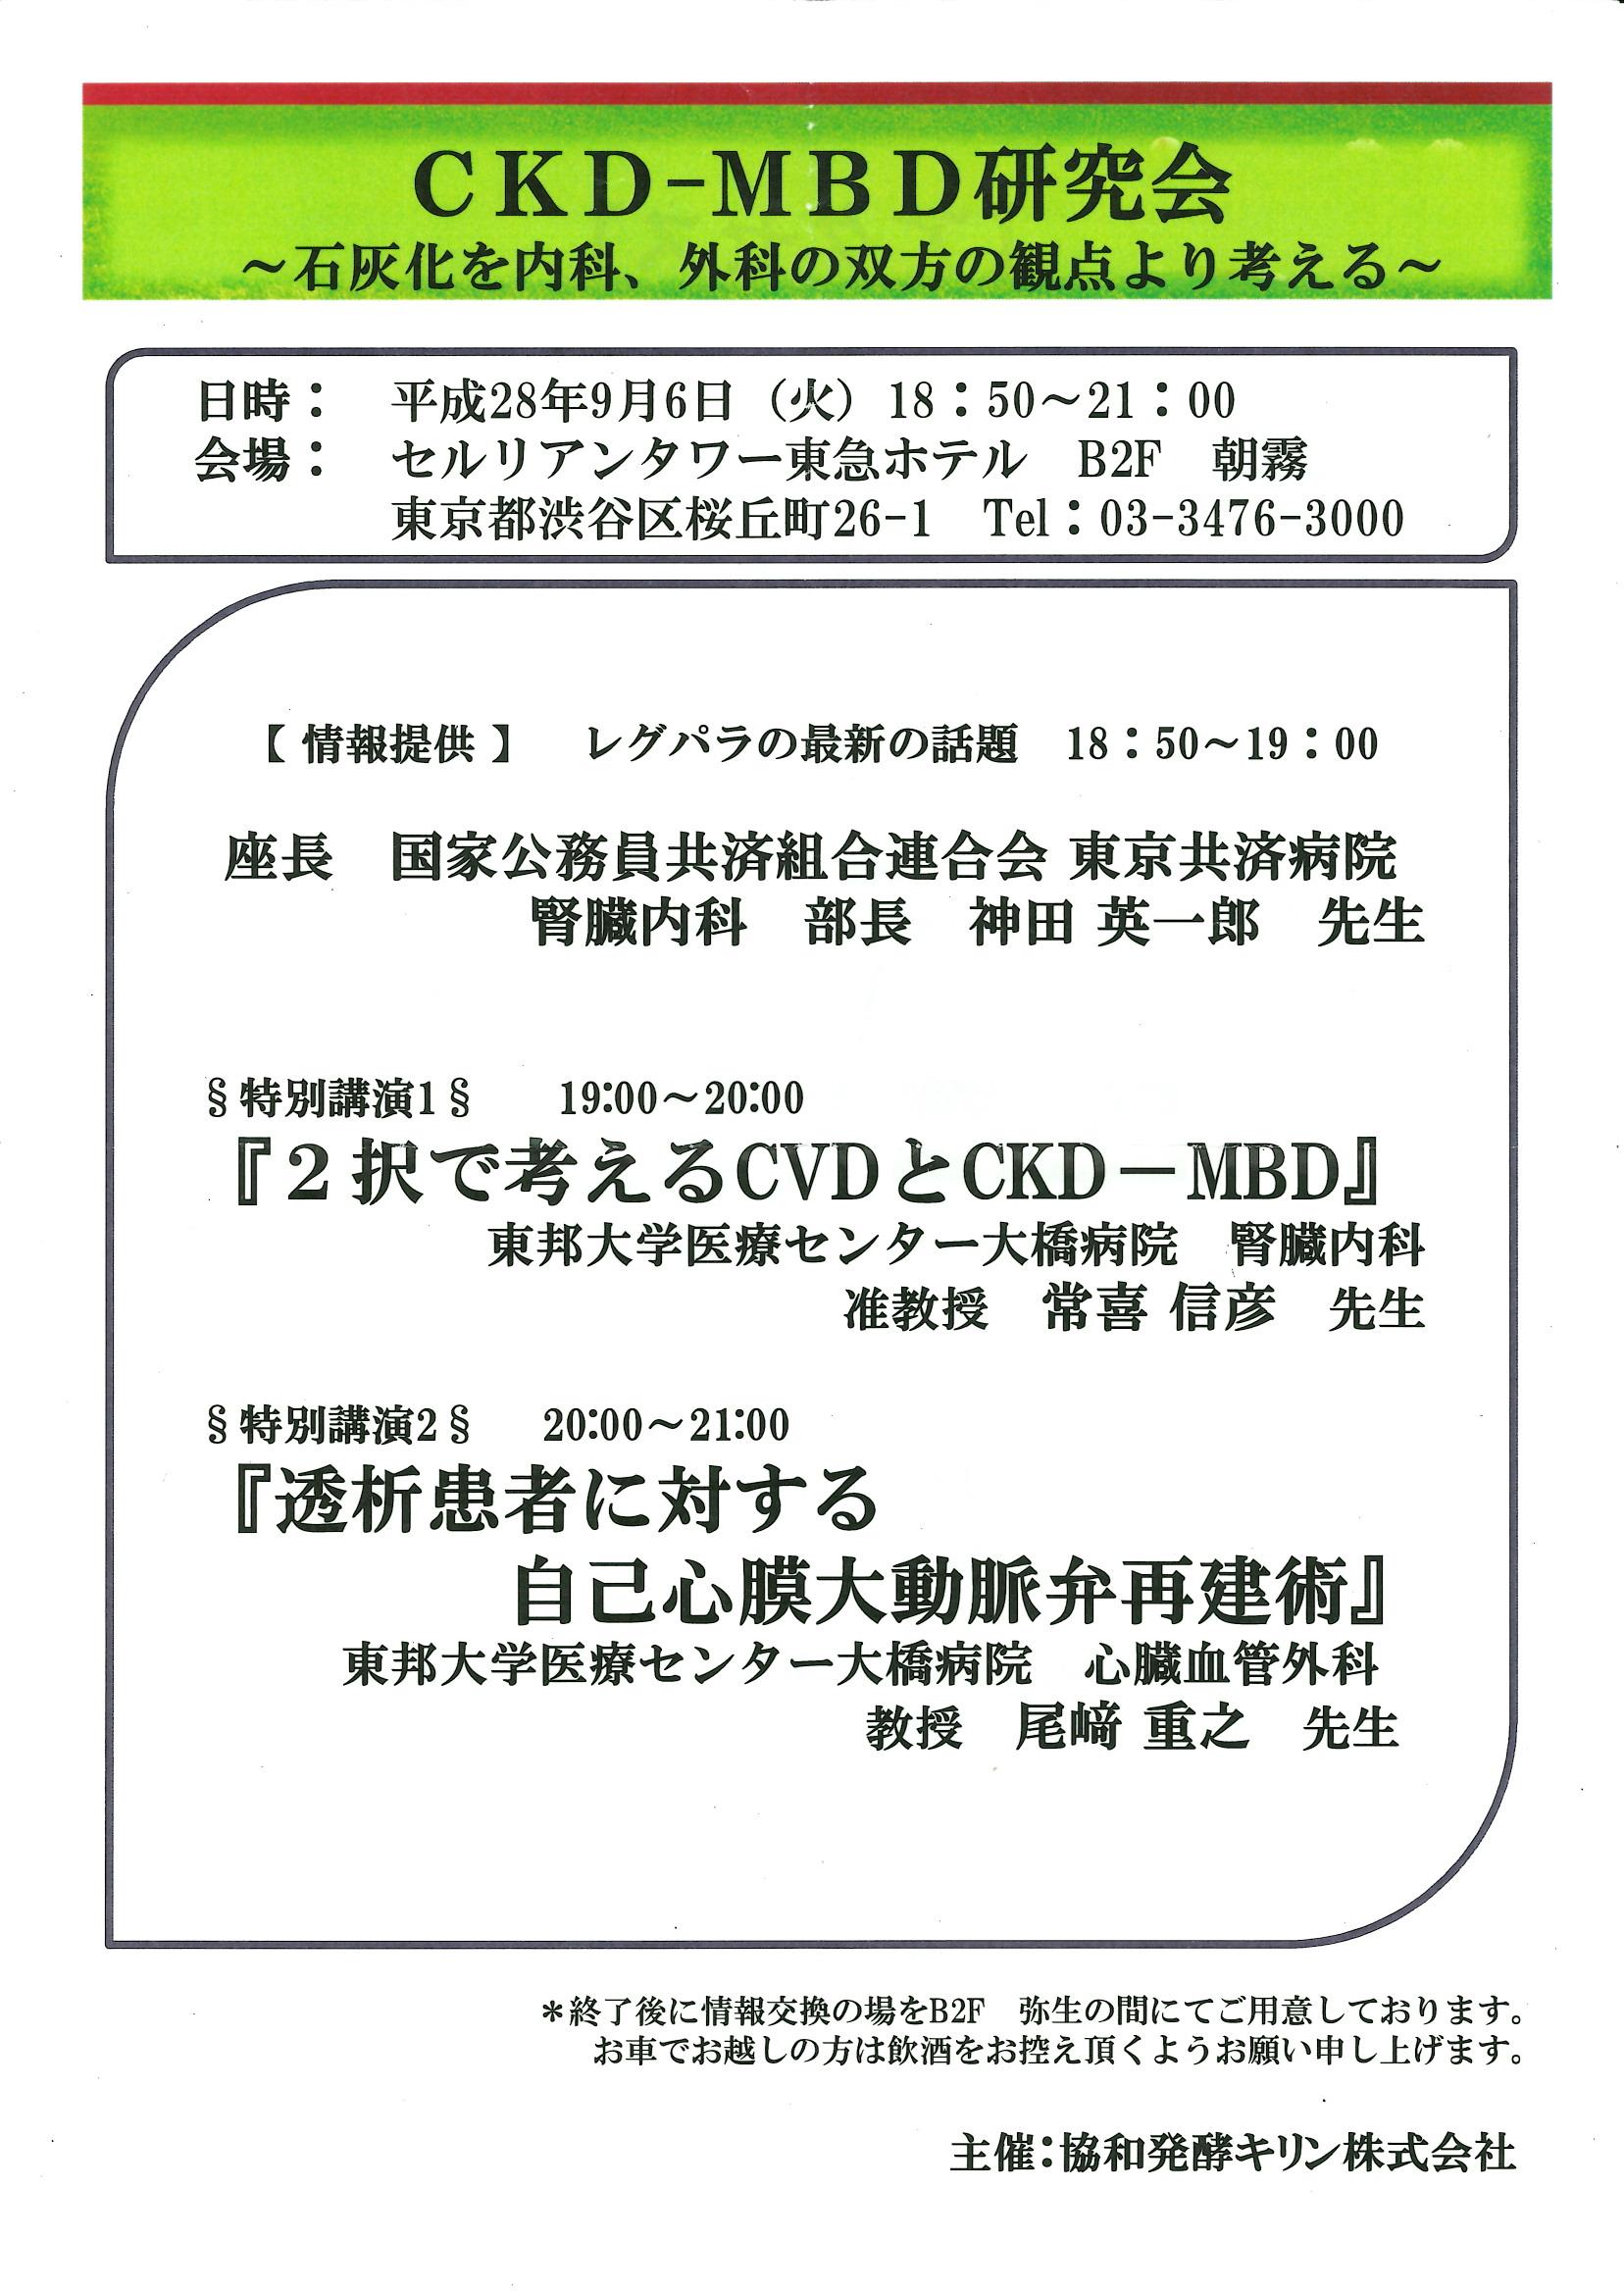 CKD-MBD